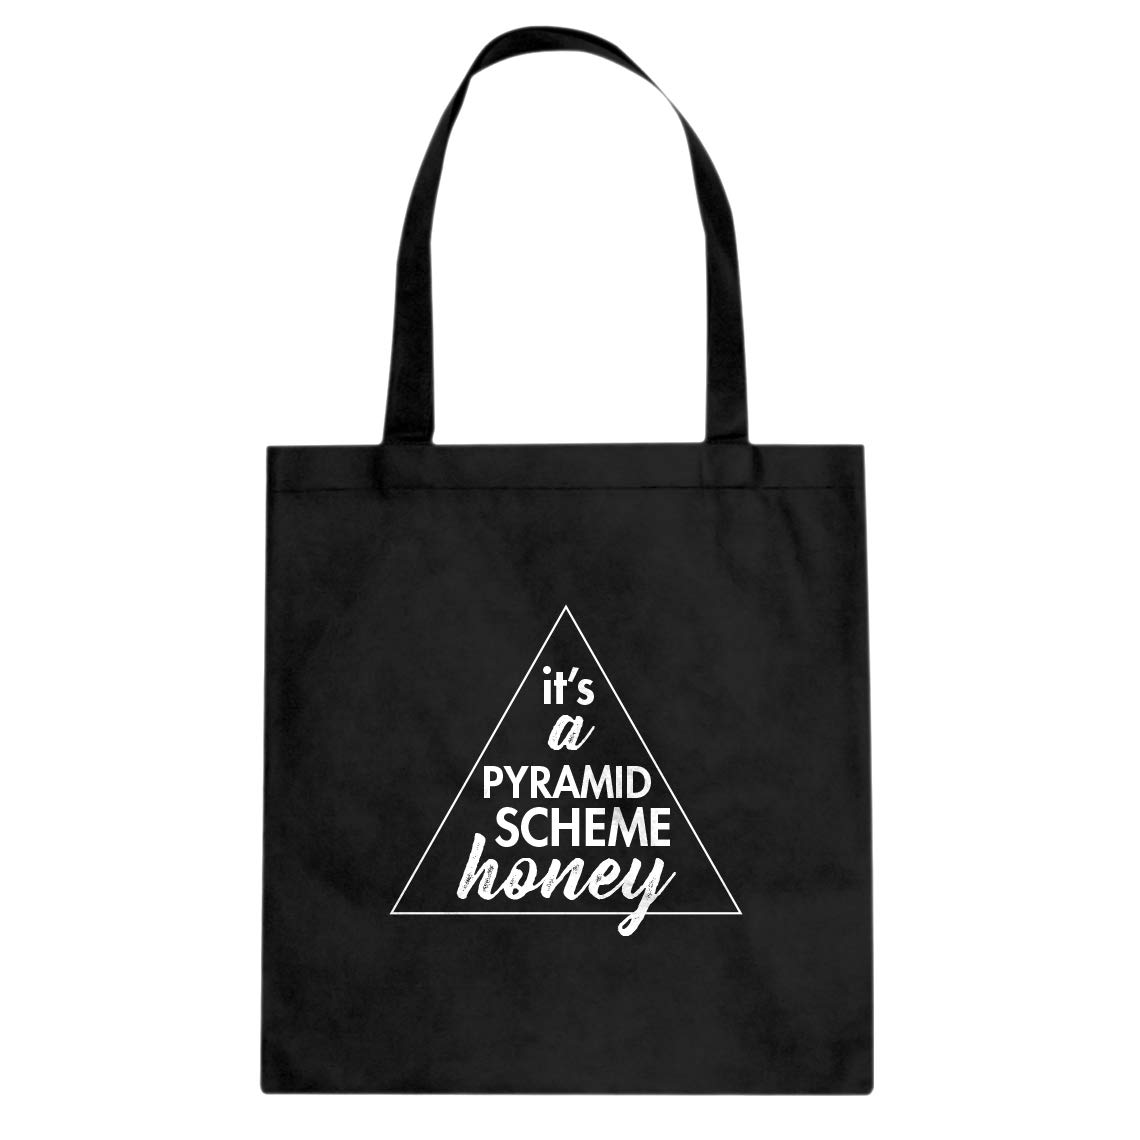 Indica Plateau Its a Pyramid Scheme Honey Cotton Canvas Tote Bag